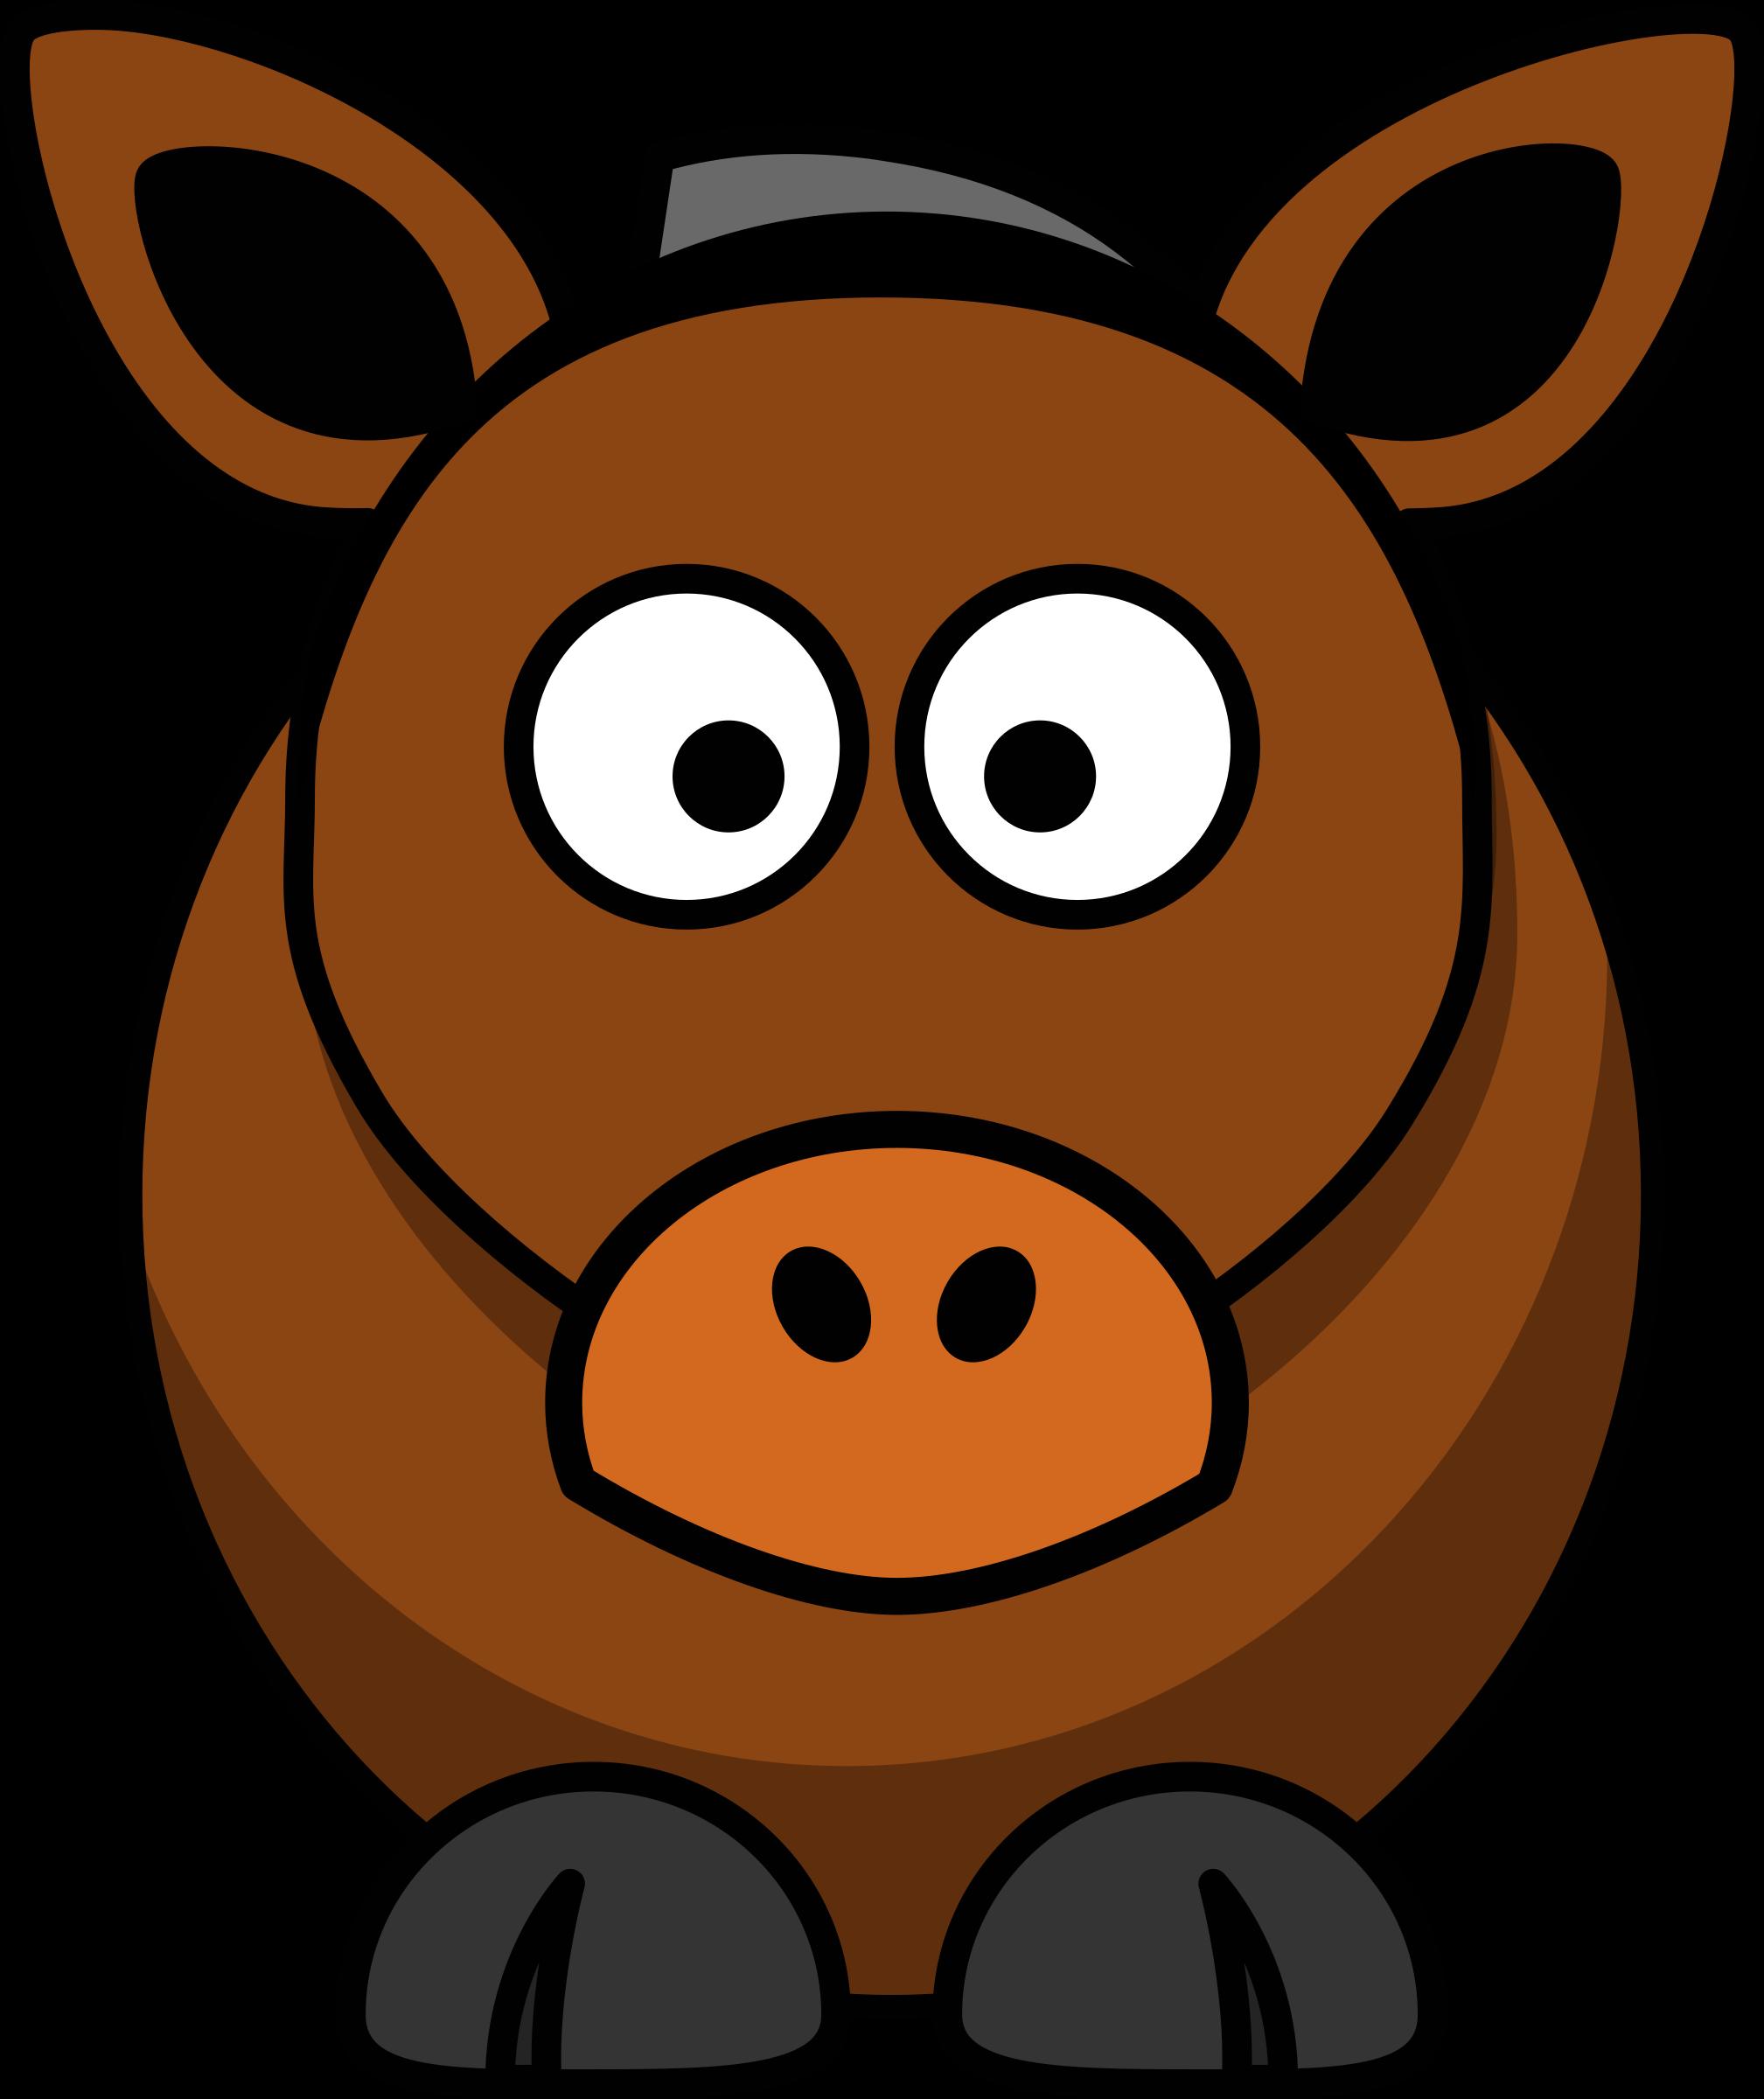 Cartoon image of free. Clipart horse cute